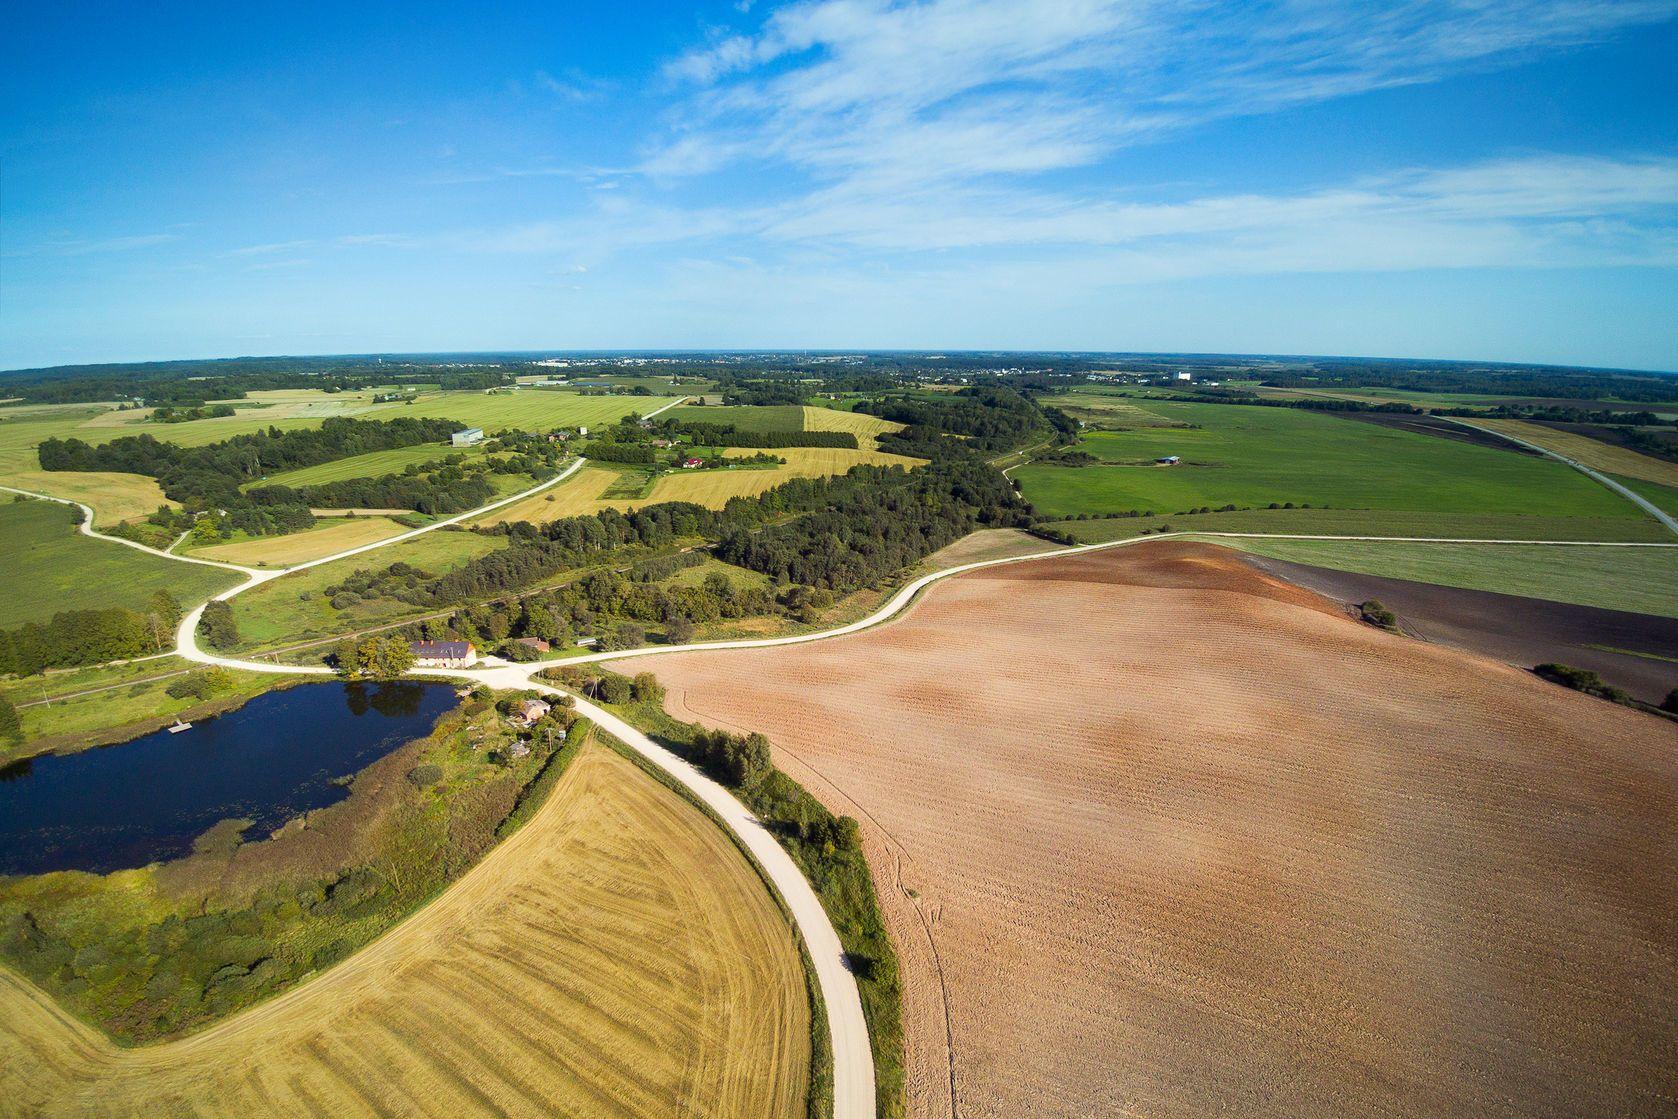 Lotyšská venkovská krajina | janka3147/123RF.com